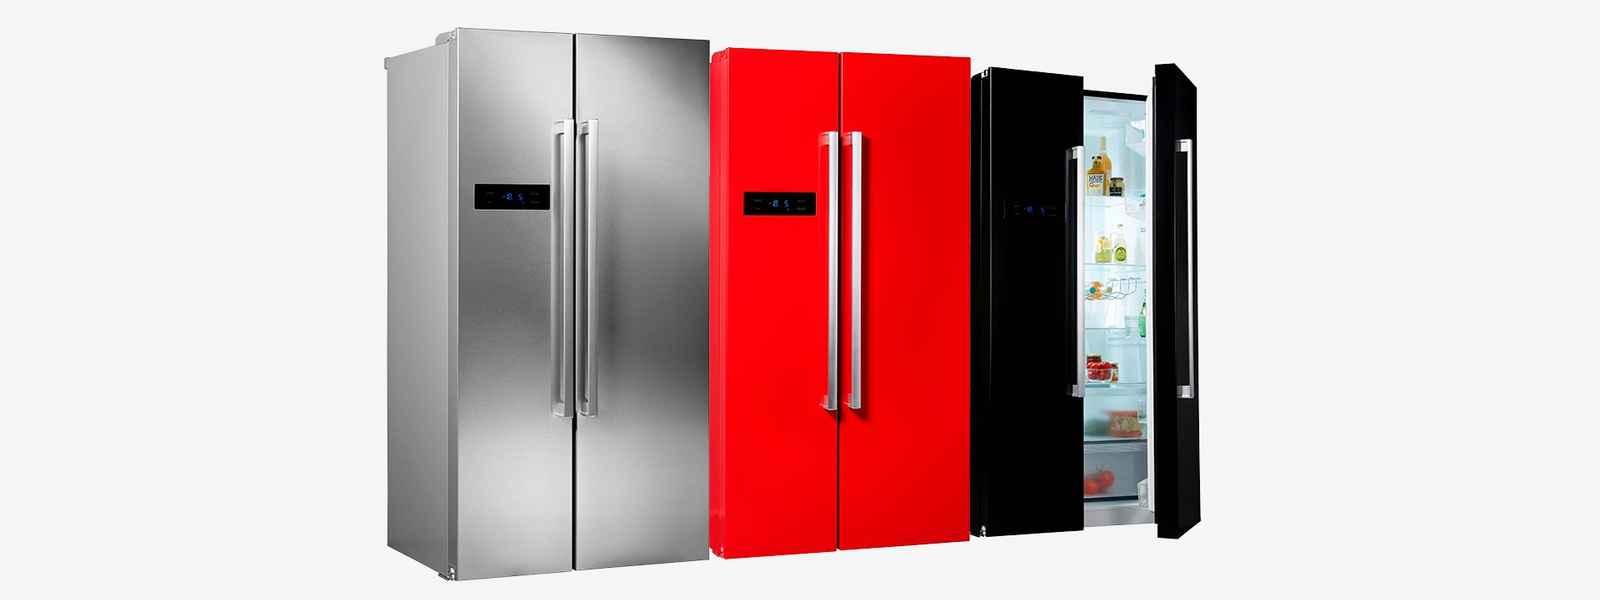 Hanseatic Kühlschränke